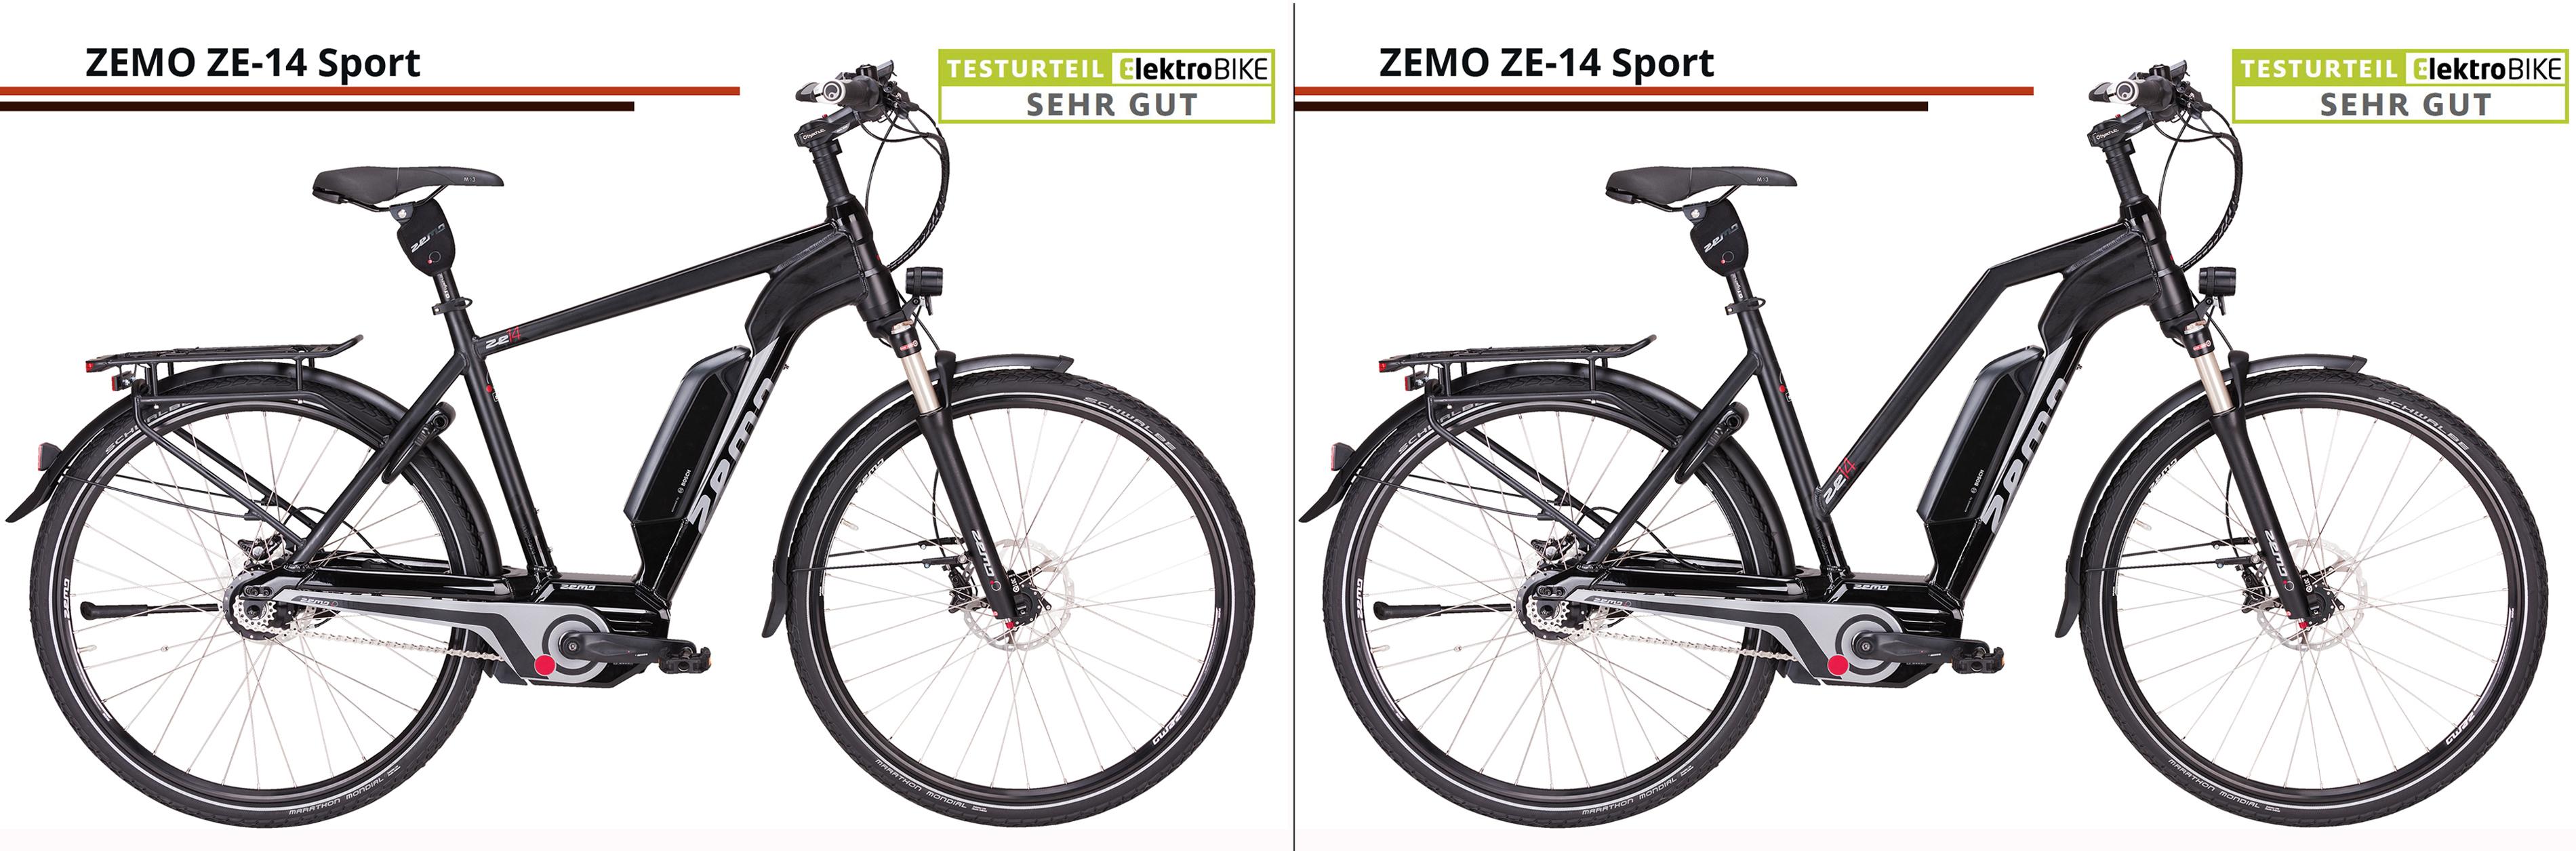 Zemo ZE-14 Sport He u Trap